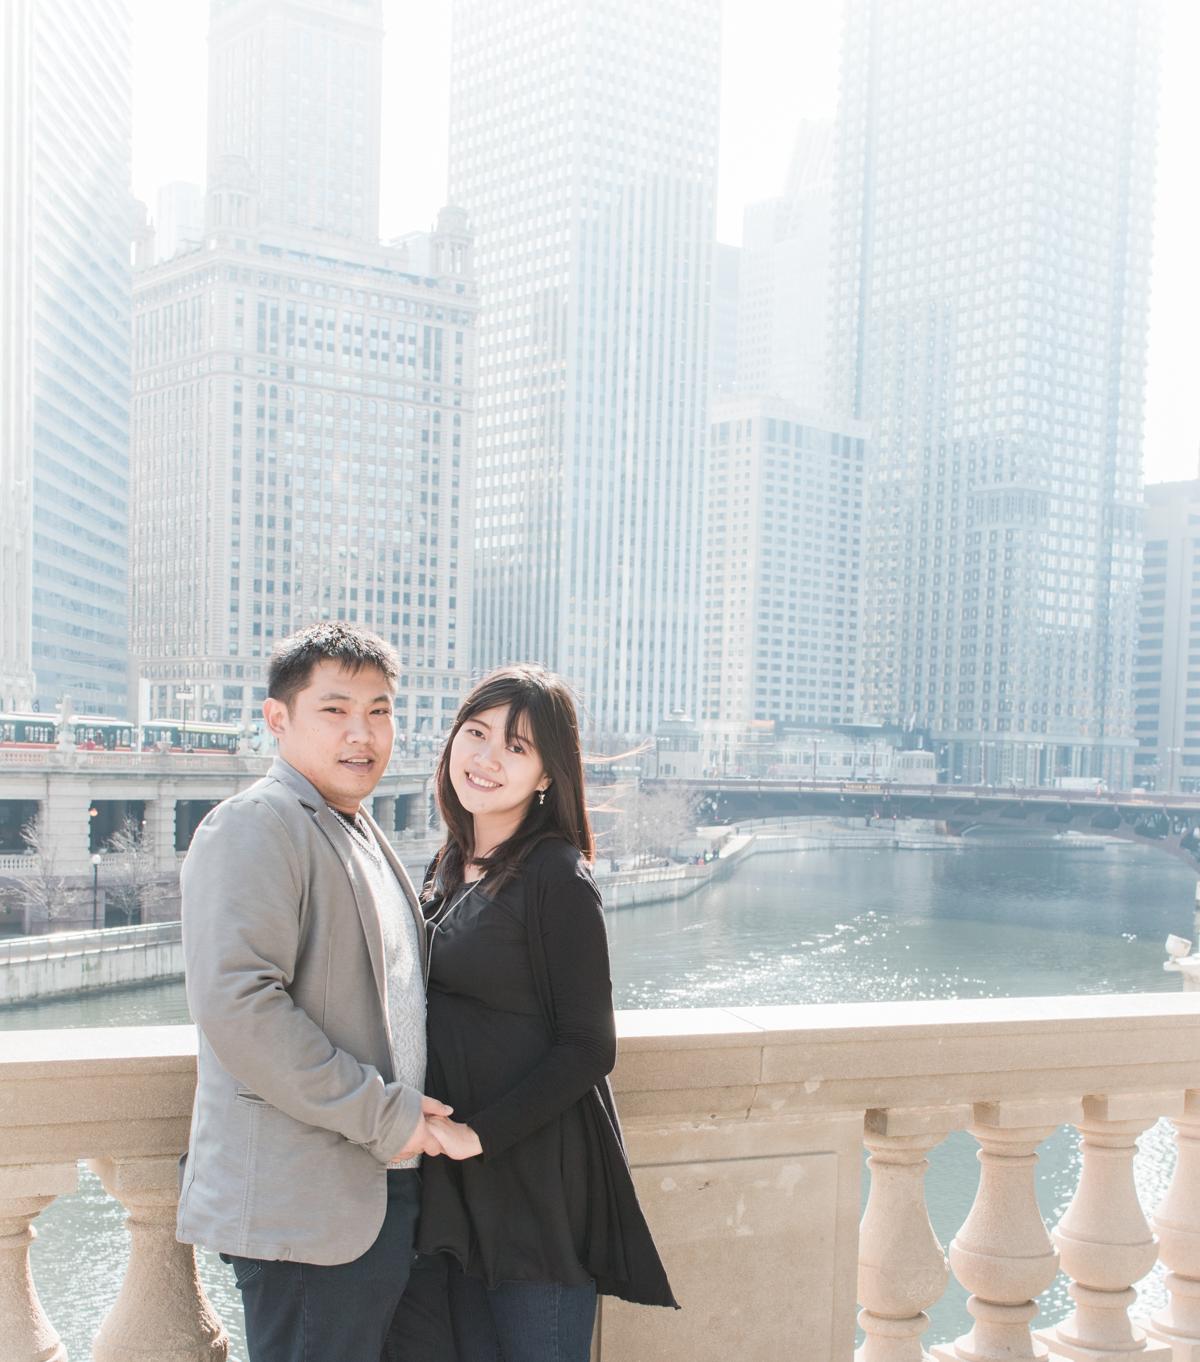 Chicago River Photo